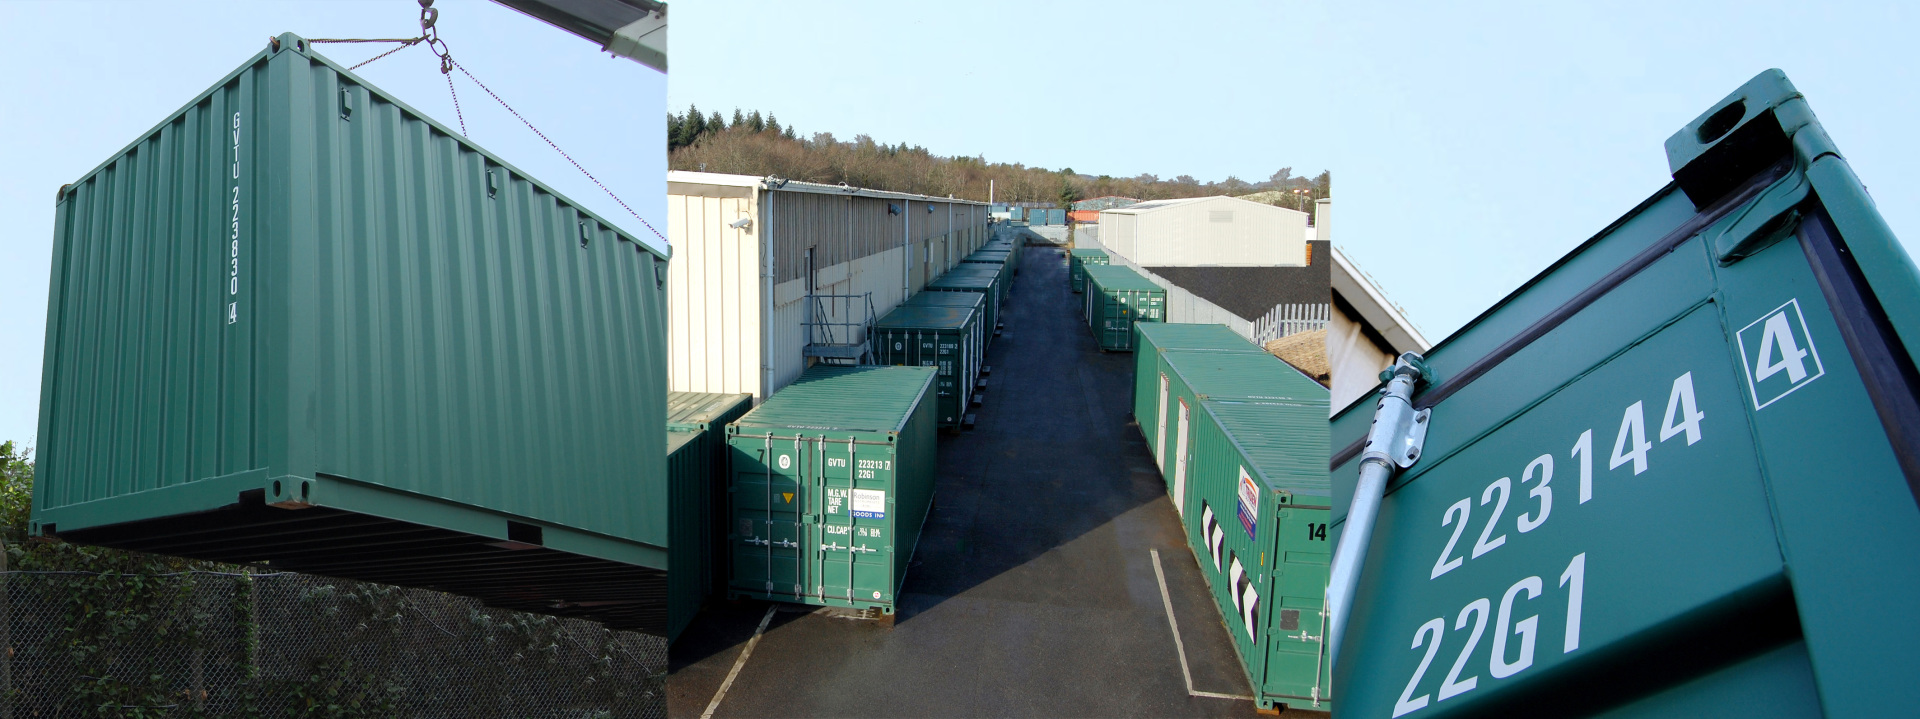 Triden Self Storage Unit Container Green Home